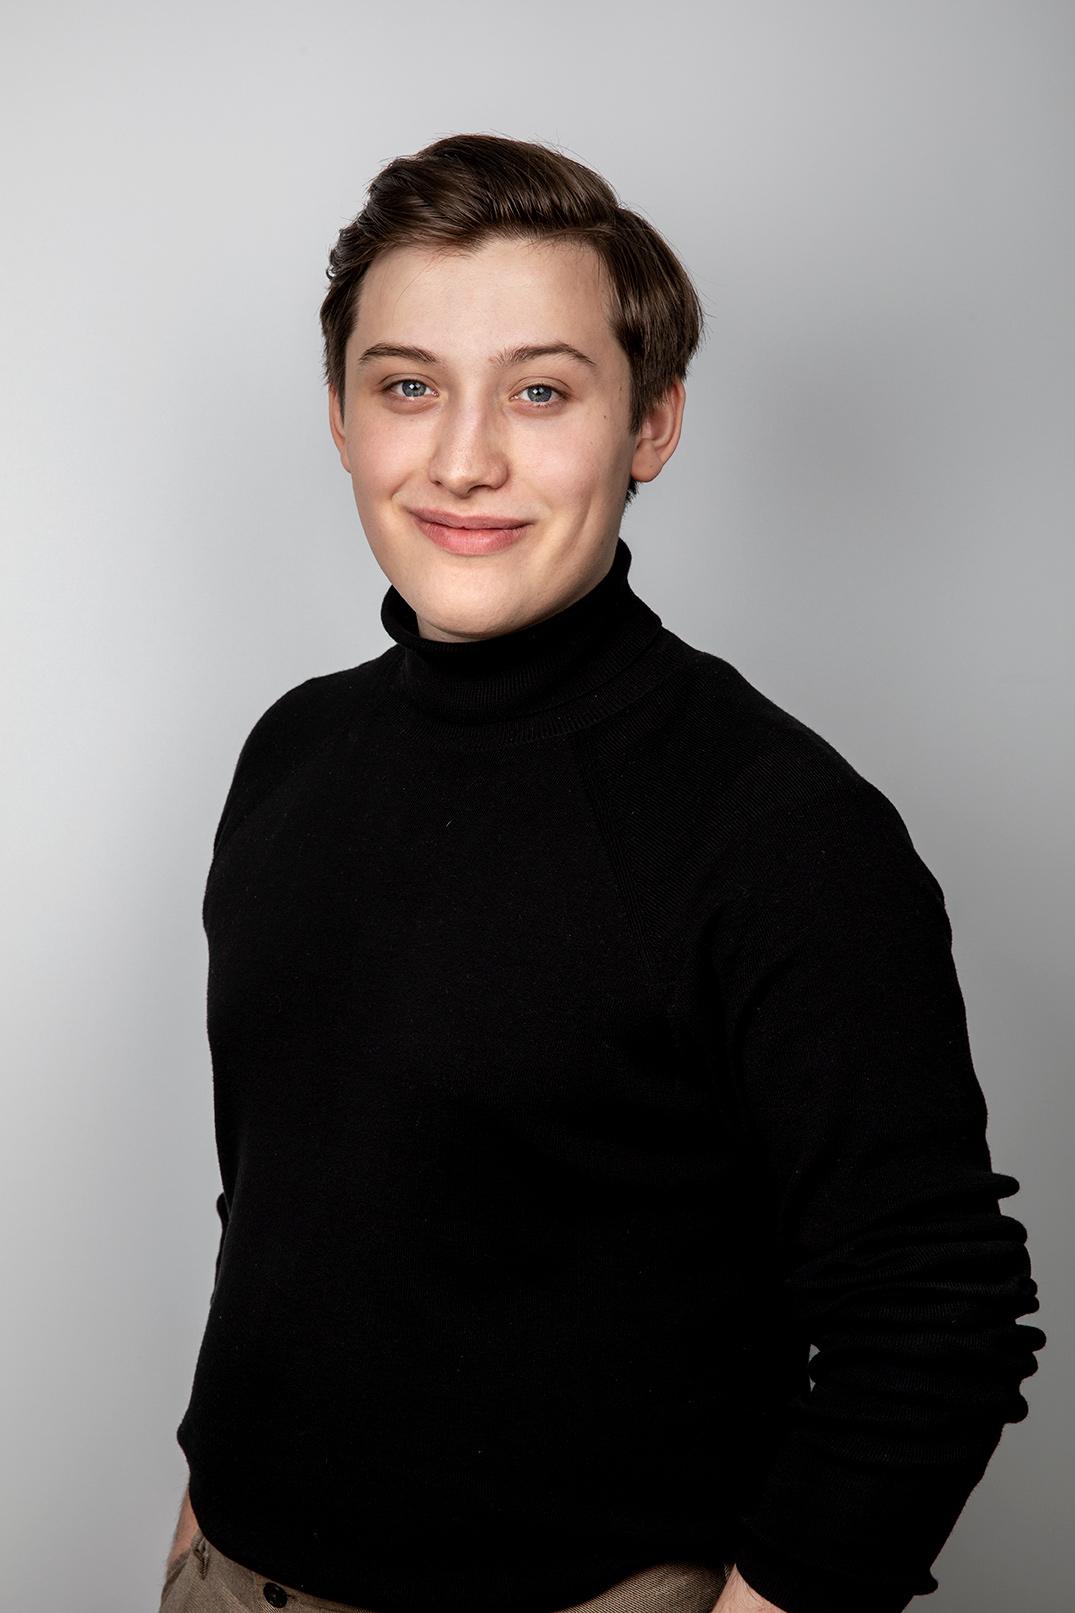 Robin Irberger